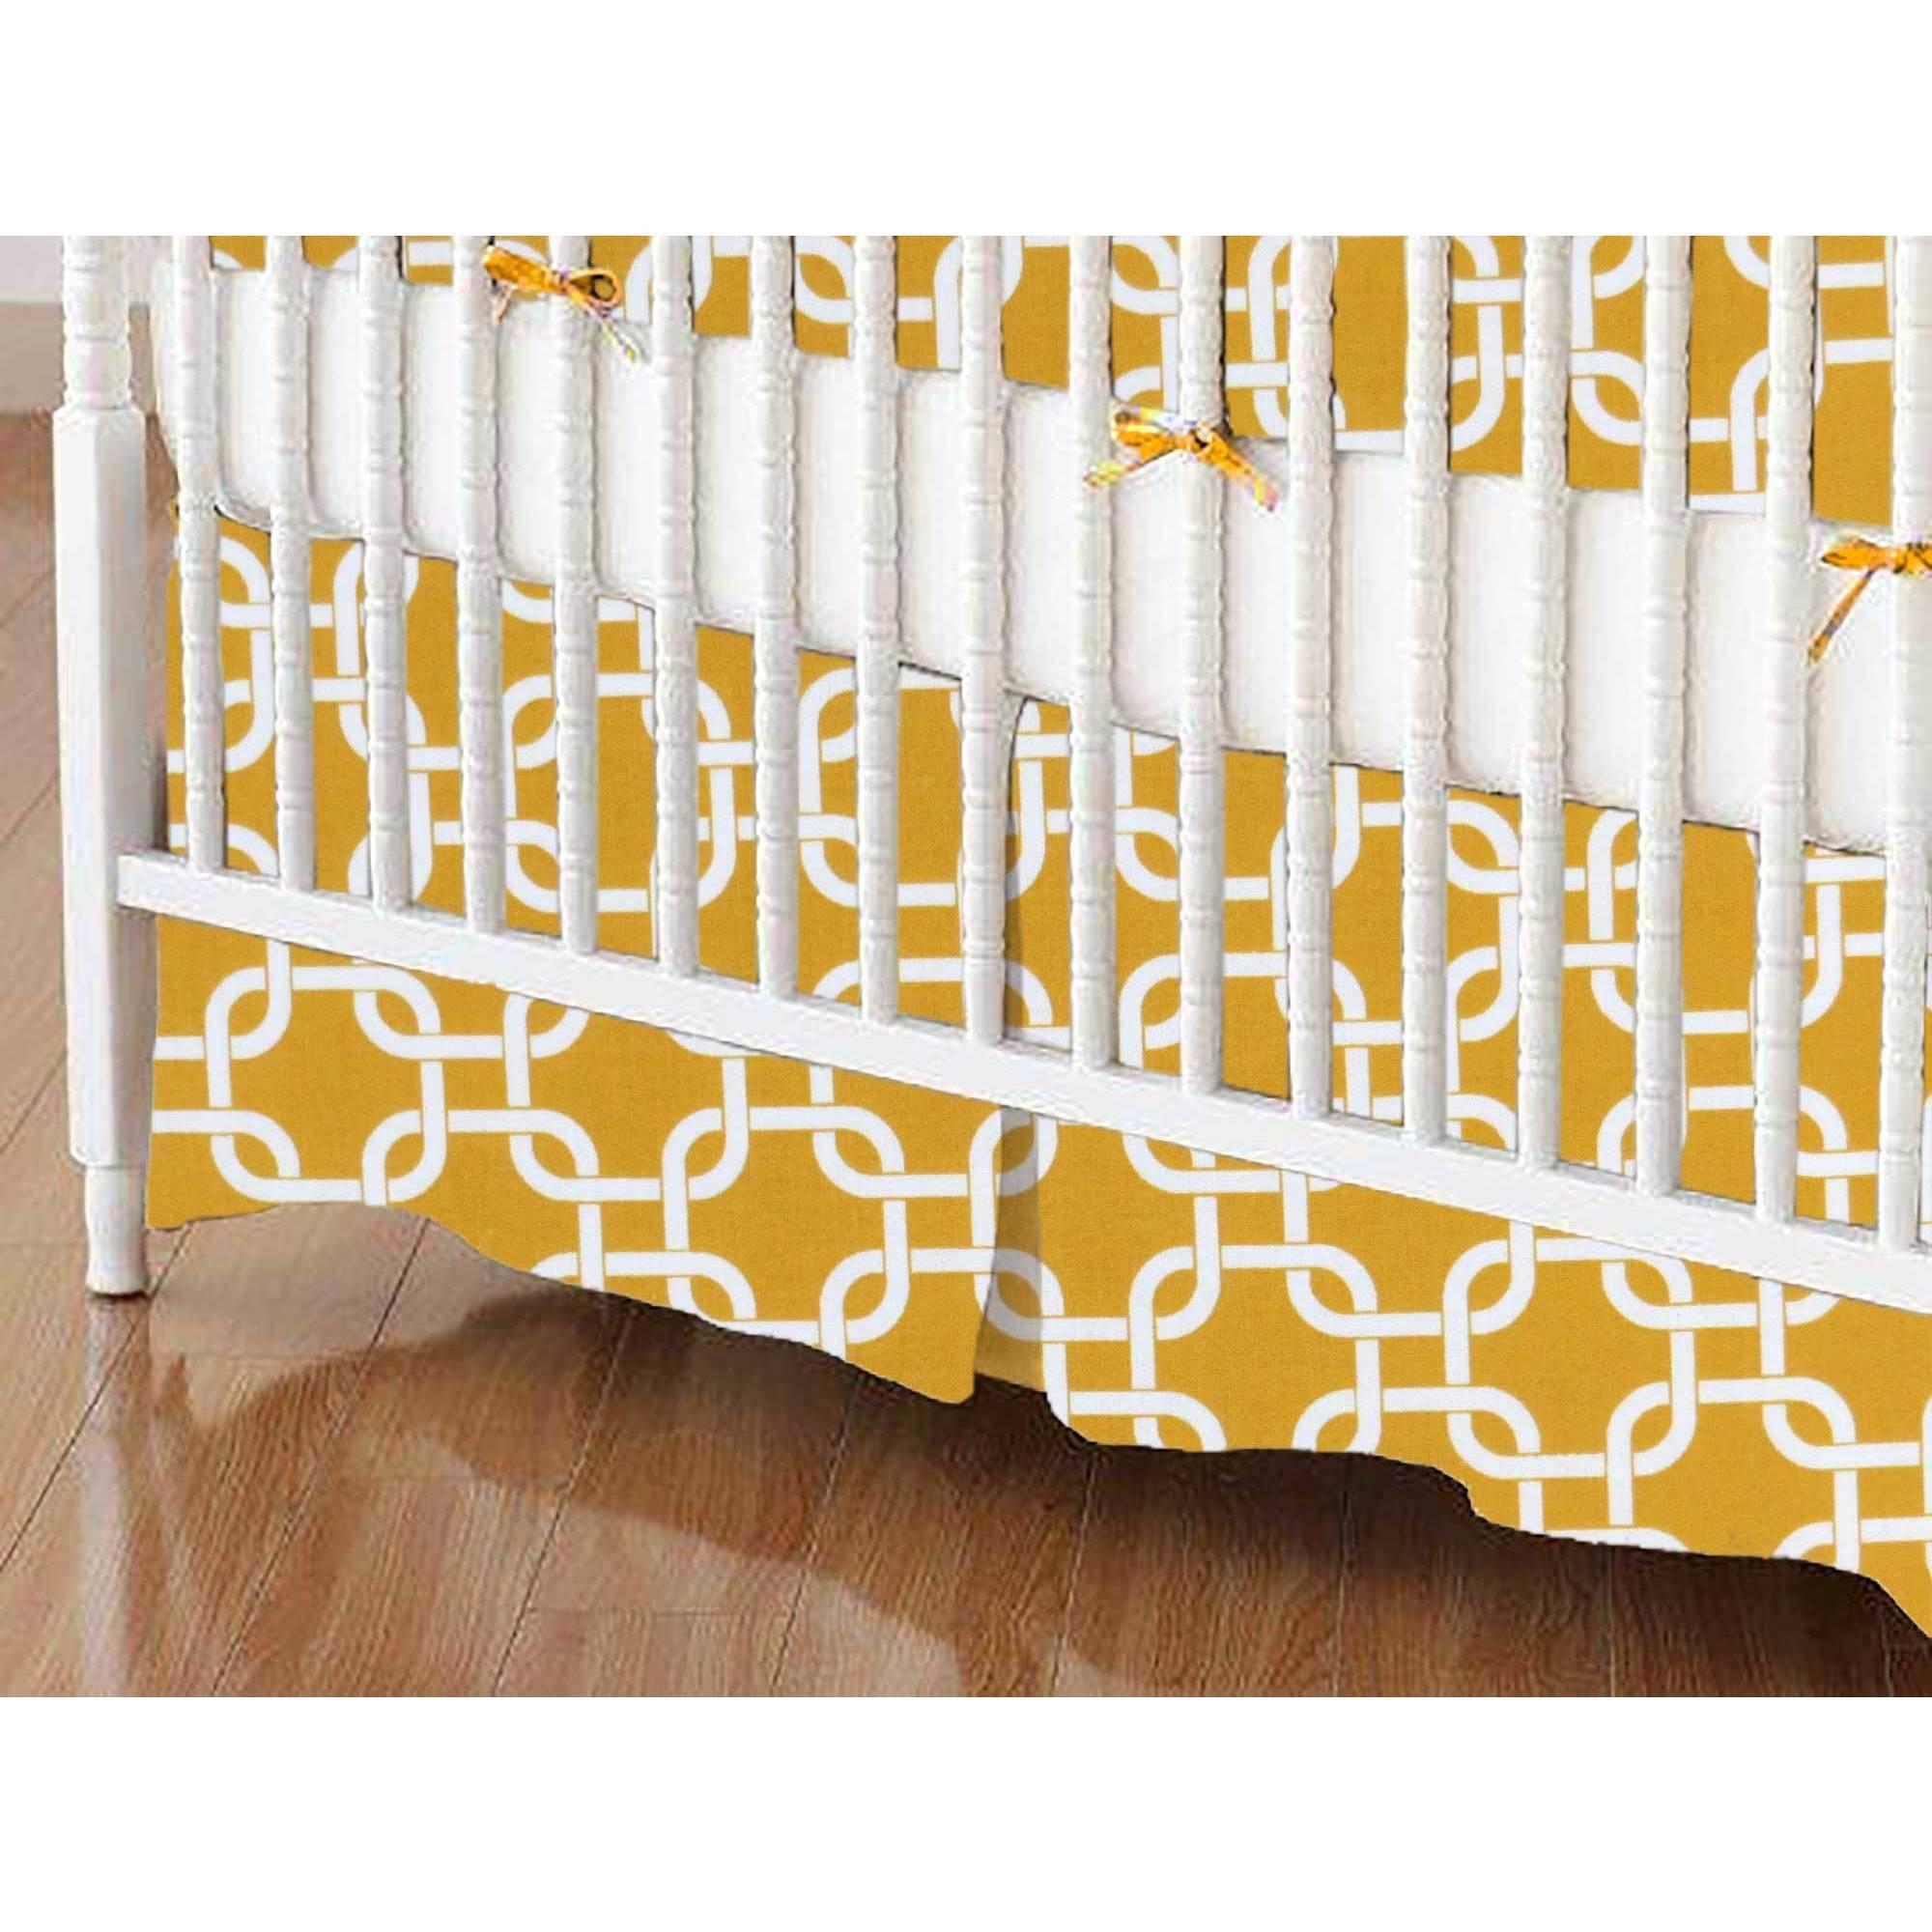 SheetWorld Crib Skirt - Mustard Yellow Links